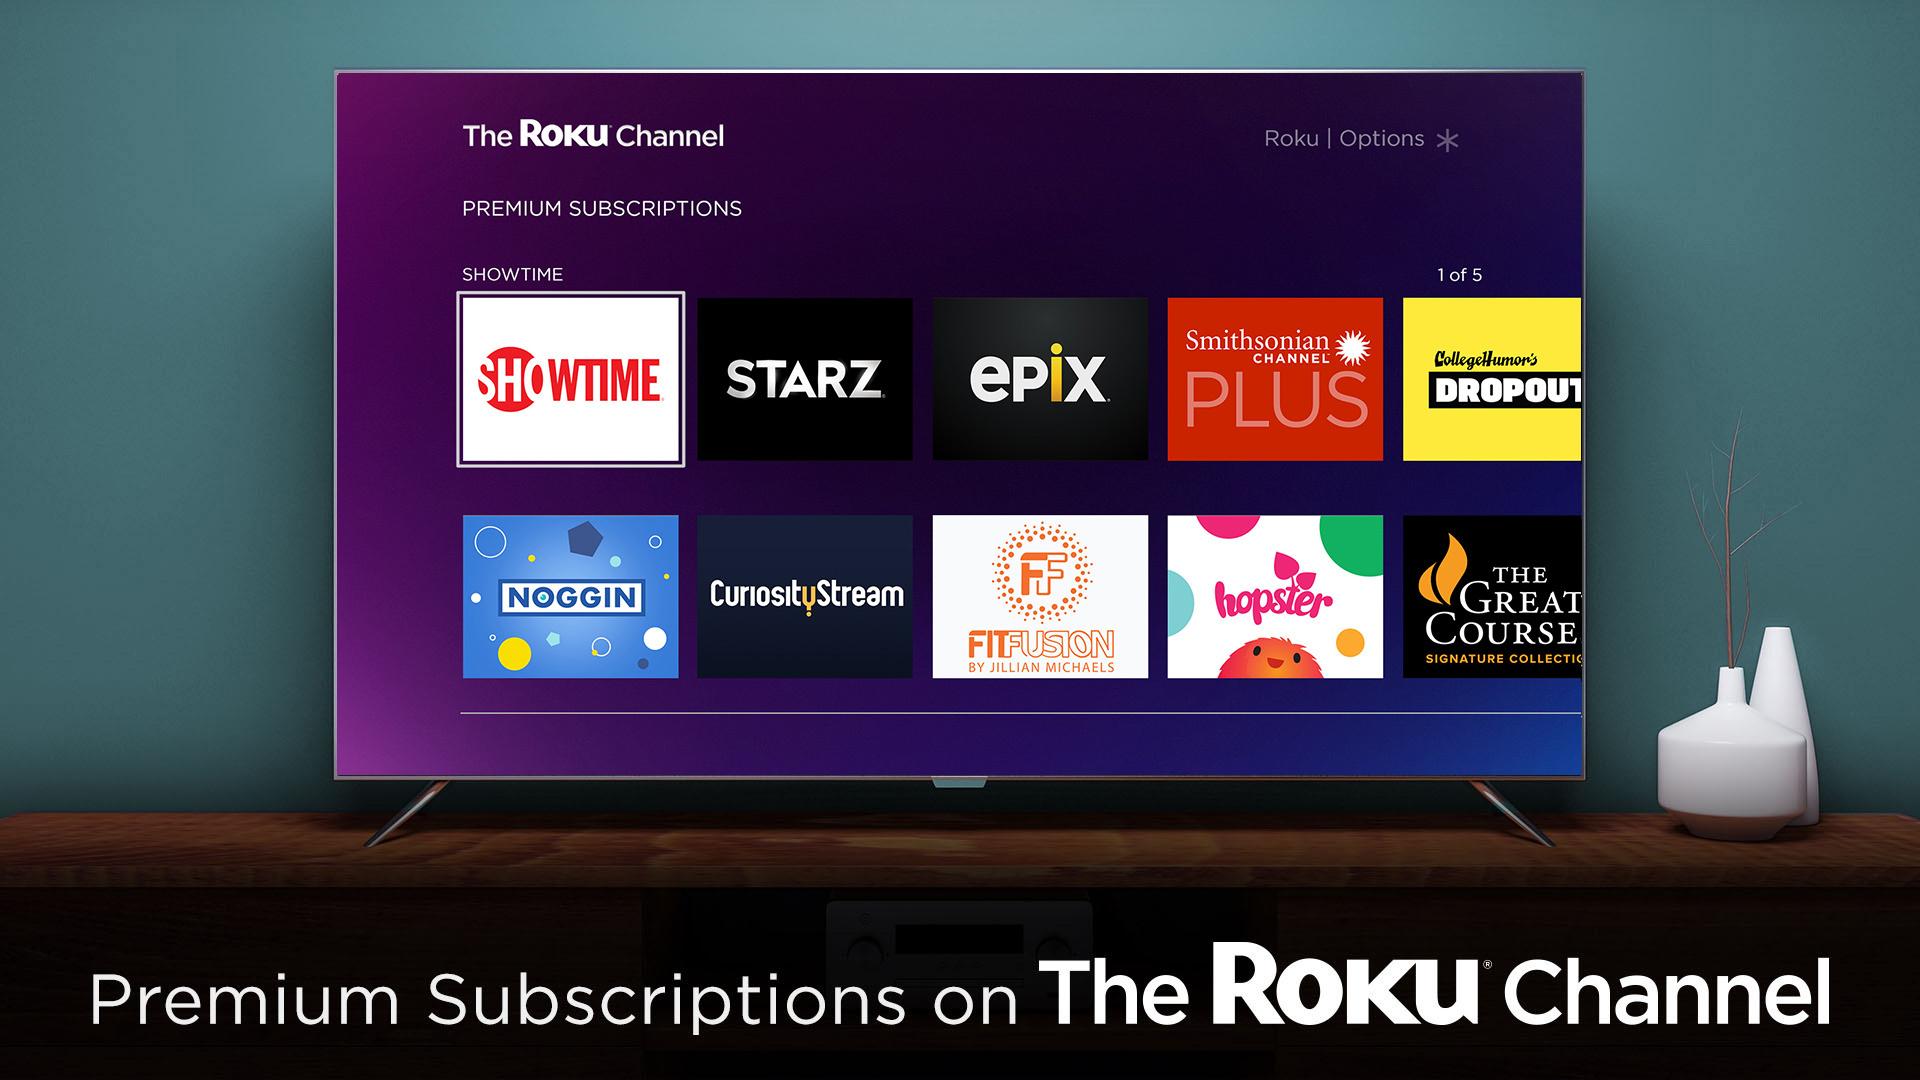 A Roku TV showing premium subscriptions.